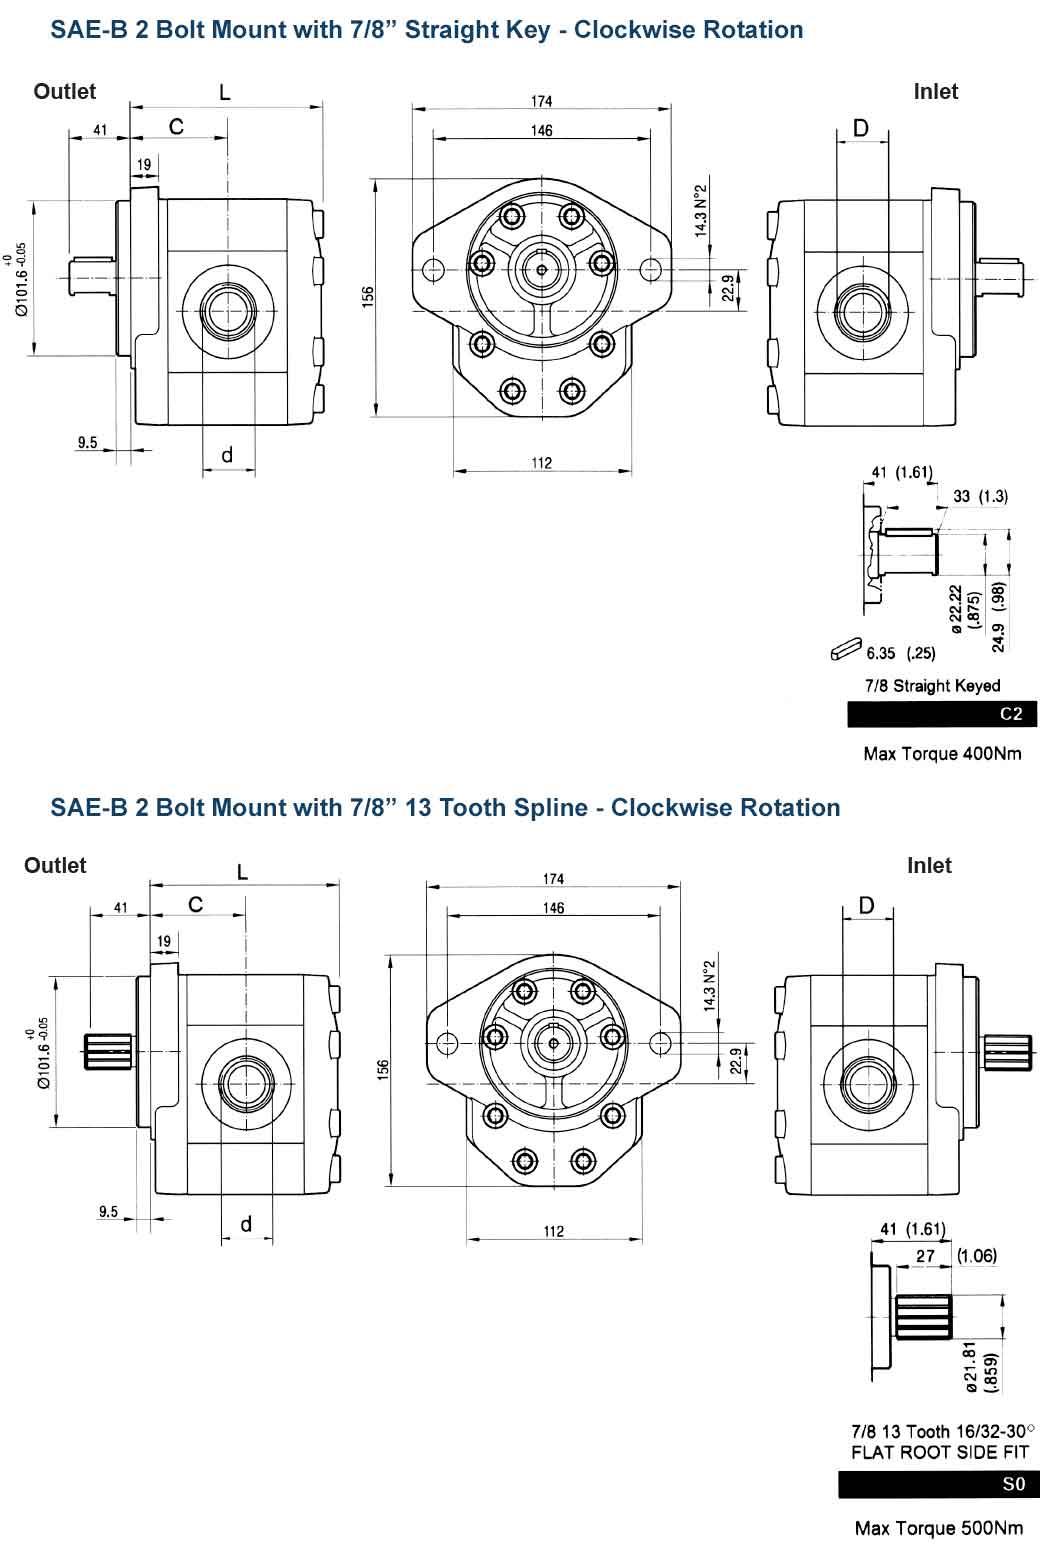 P3A0SAE-B2BOLTMOUNTdimensions